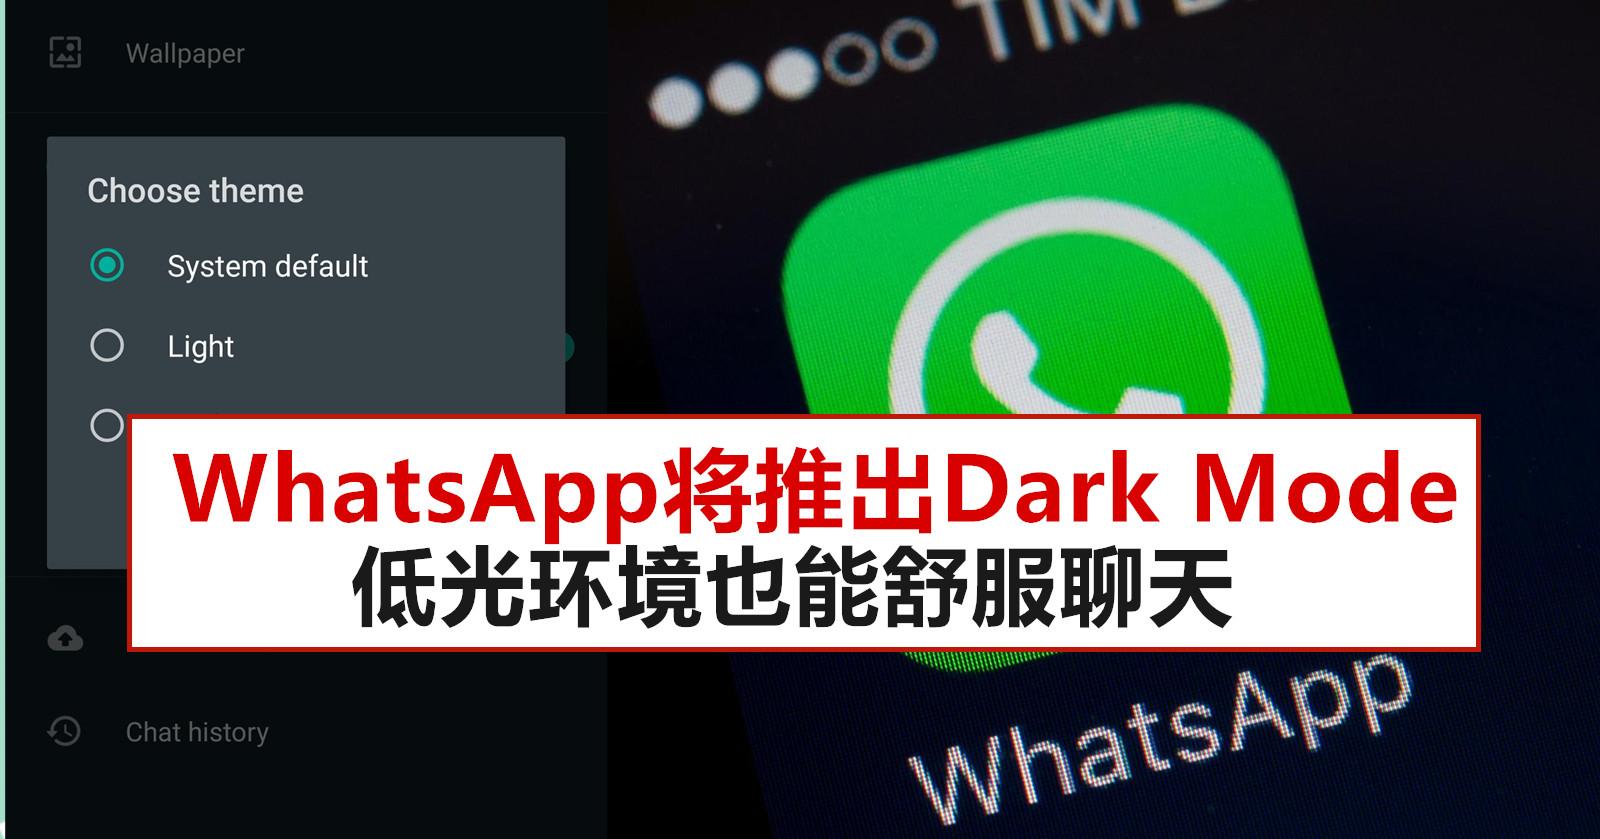 WhatsApp将推出Dark Mode